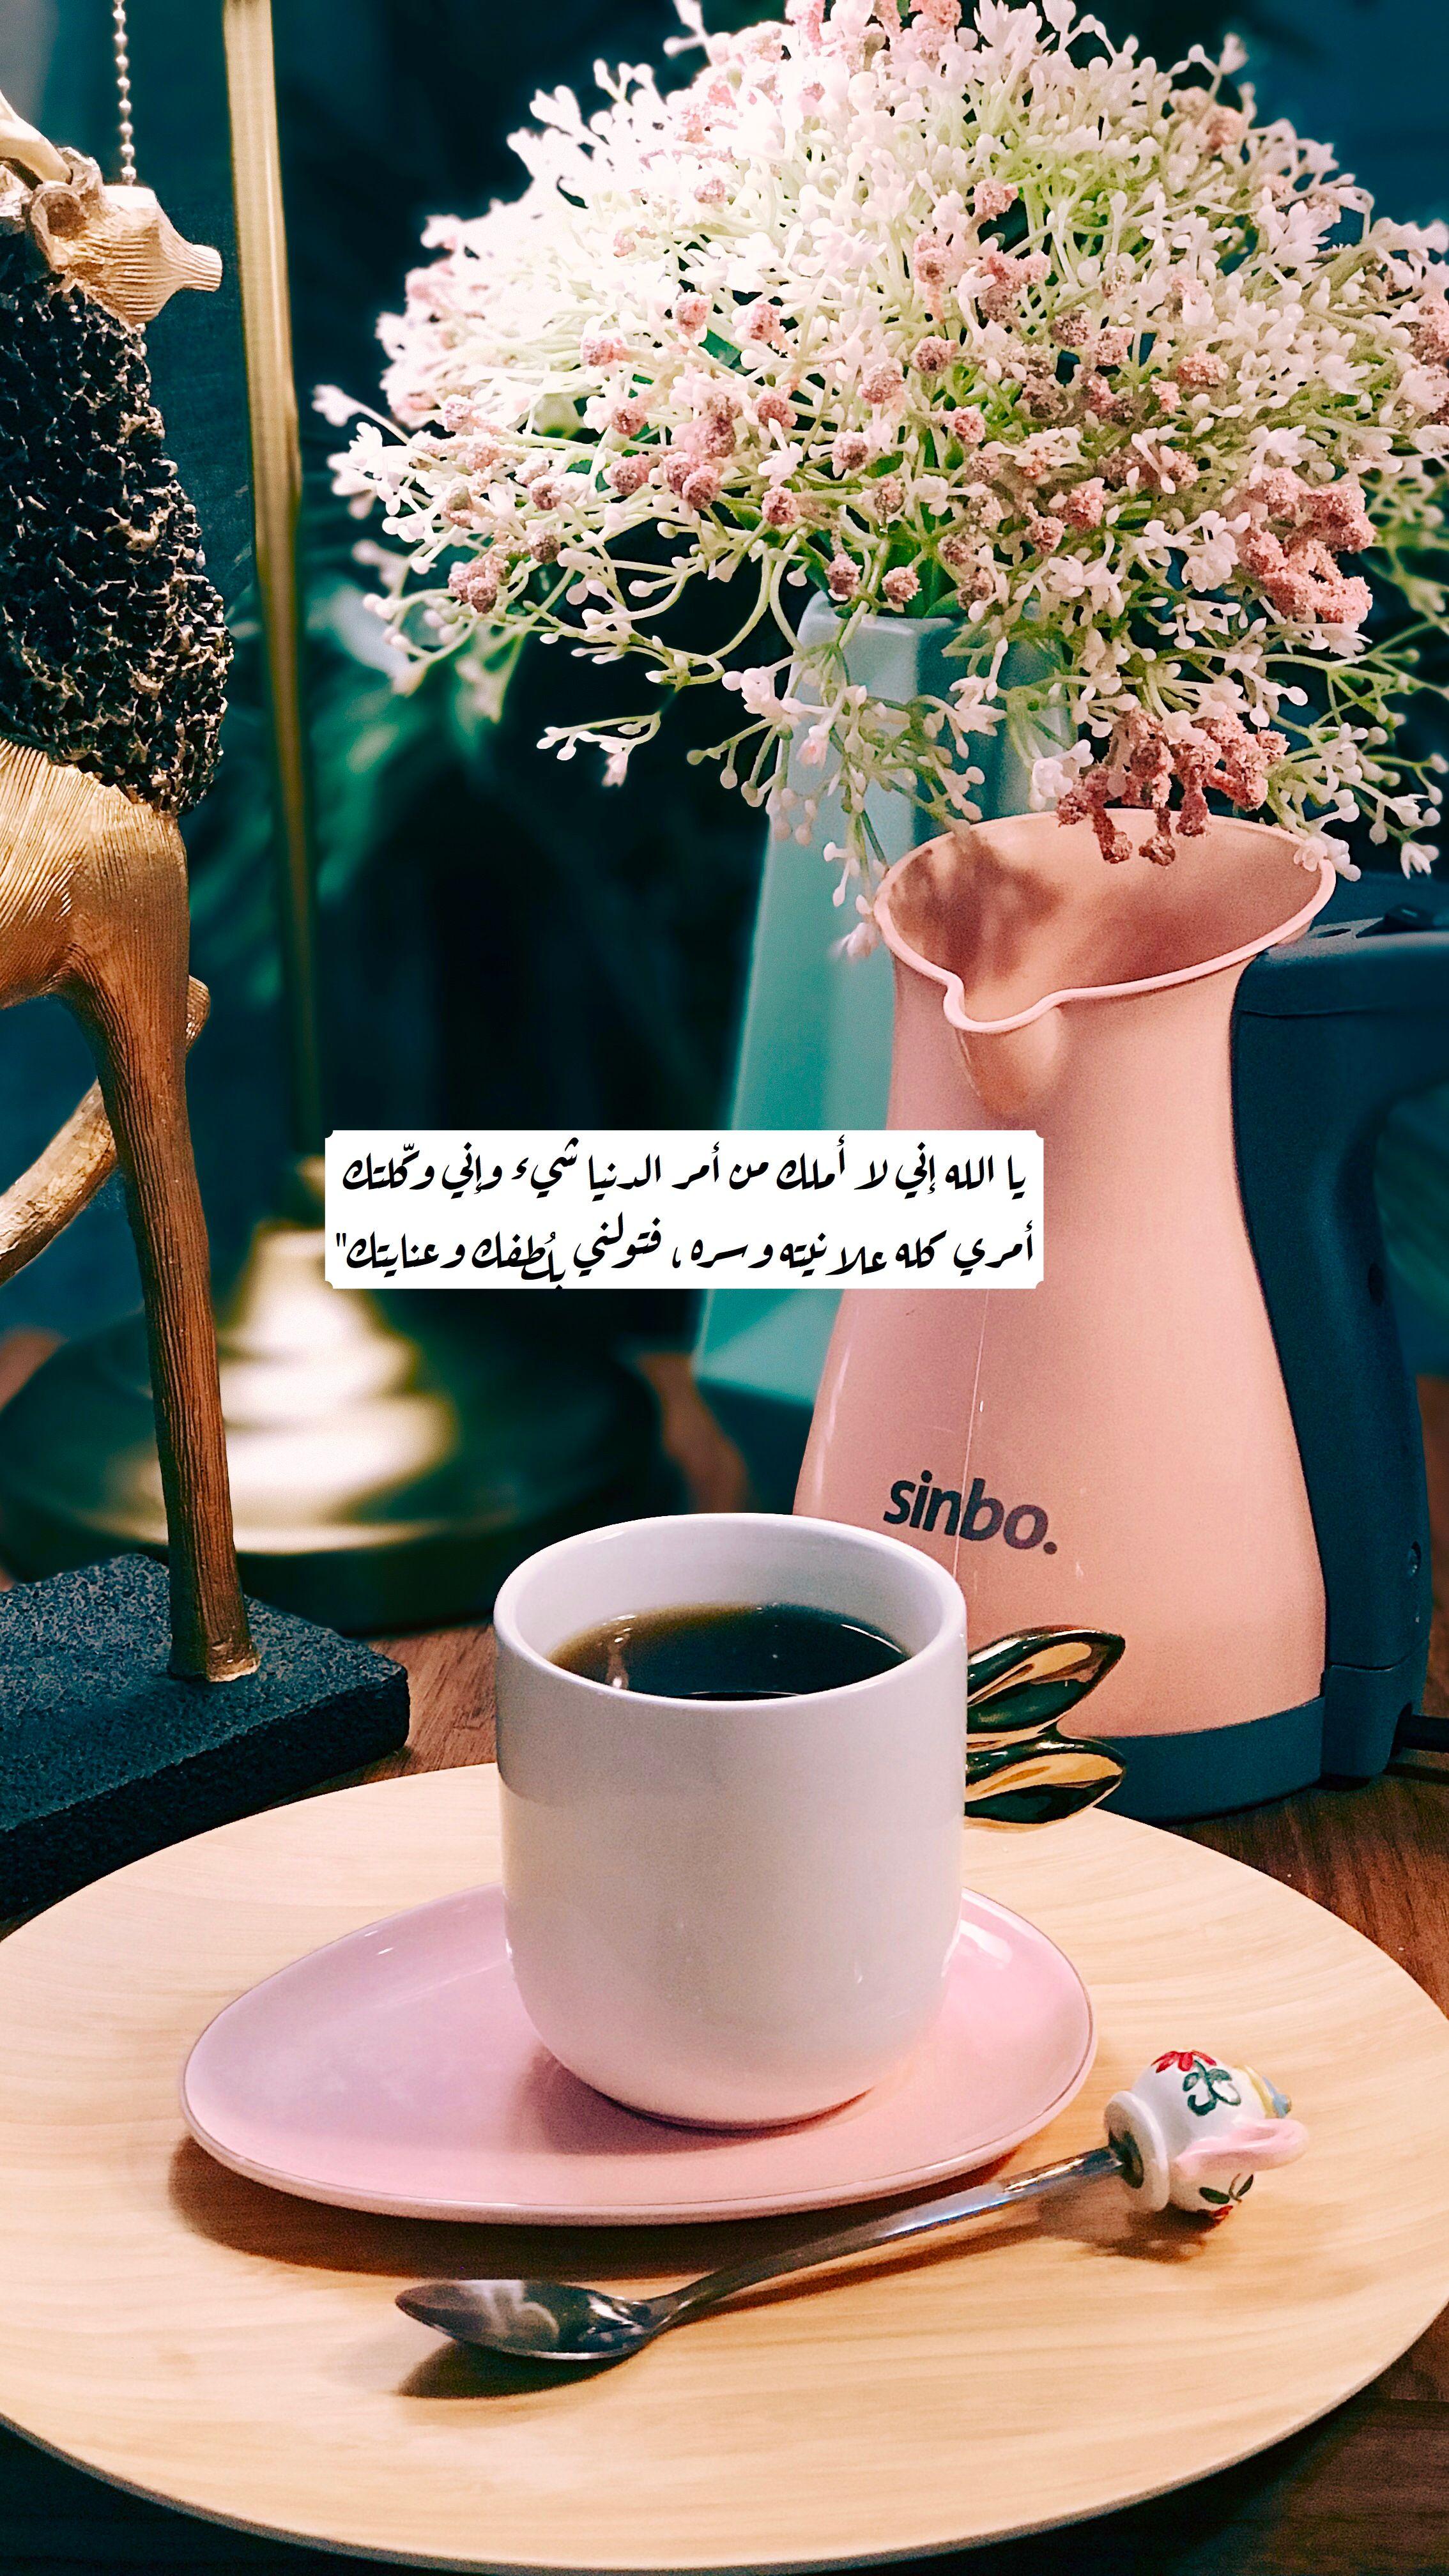 Pin By Shino Hack On My Saves Coffee Tableware V60 Coffee